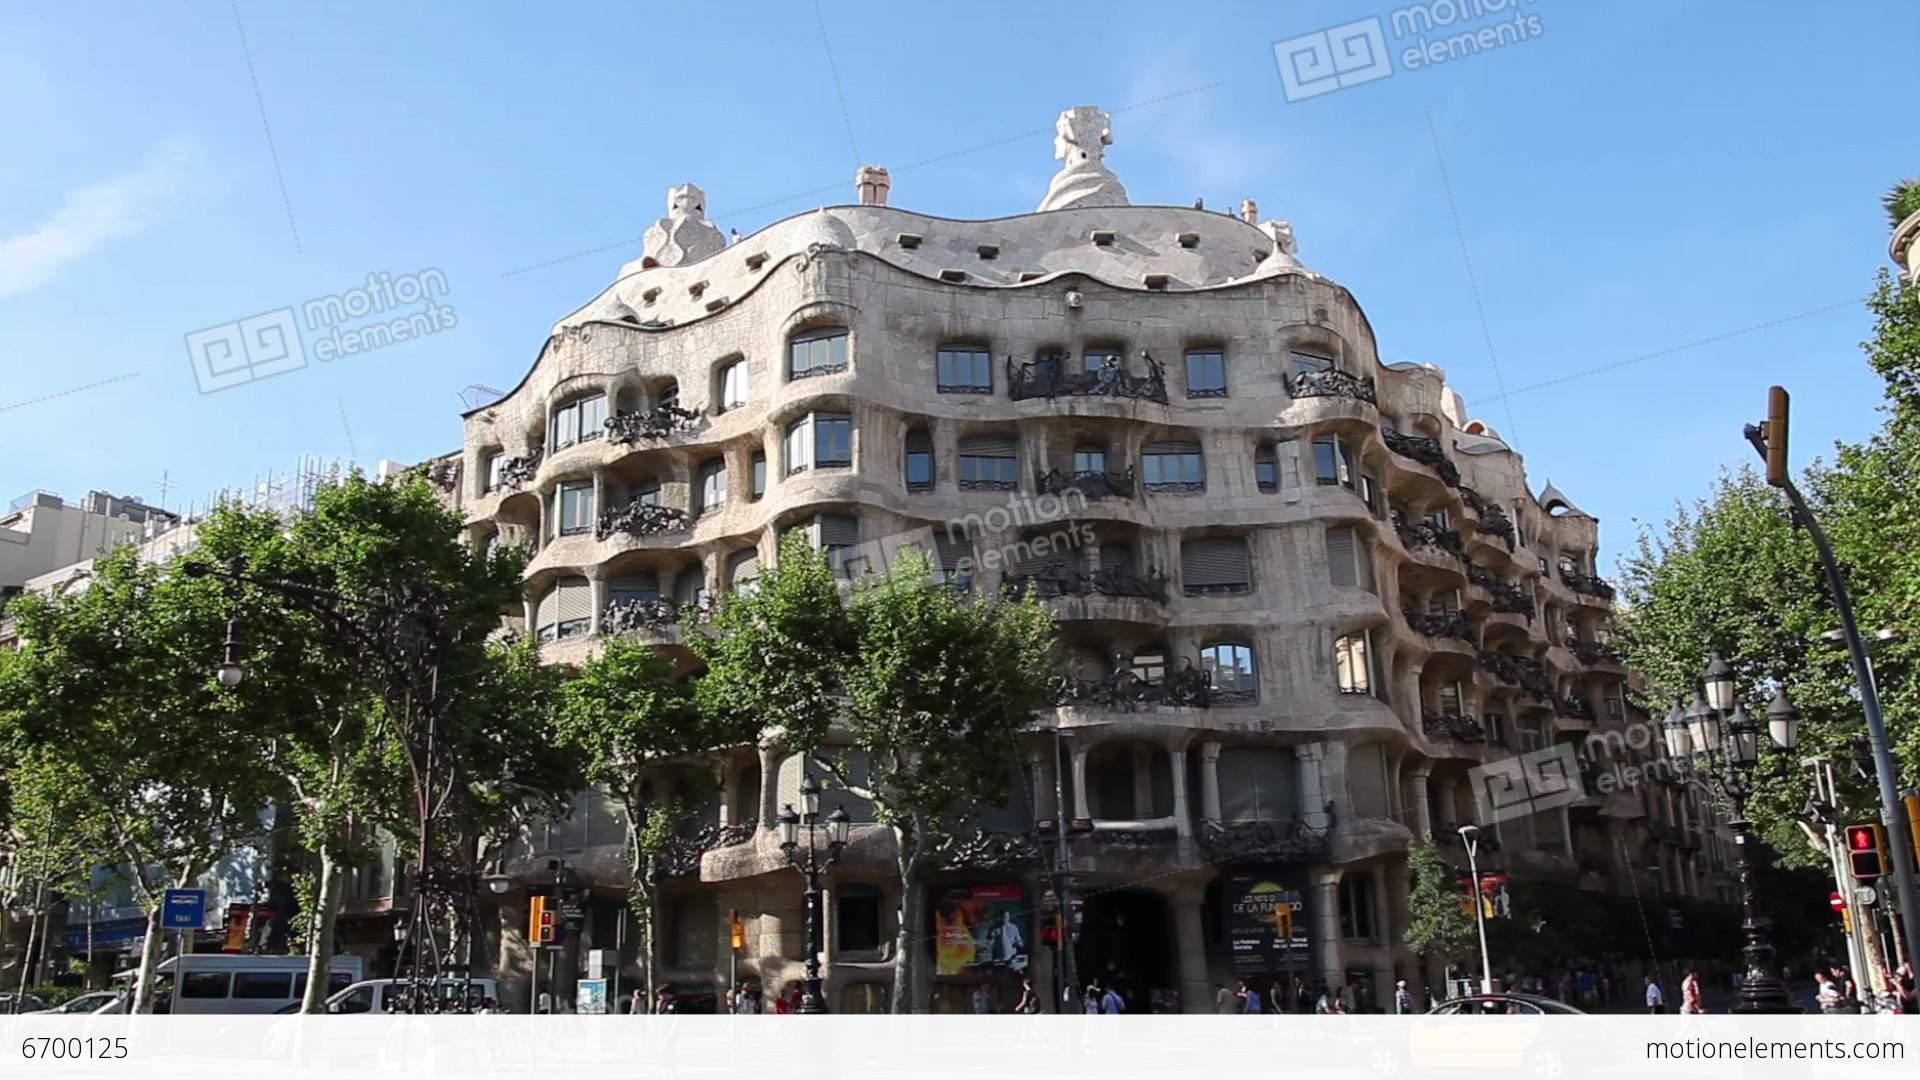 La pedrera casa mila gaudi building in barcelona stock video footage 6700125 - Casa la pedrera gaudi ...